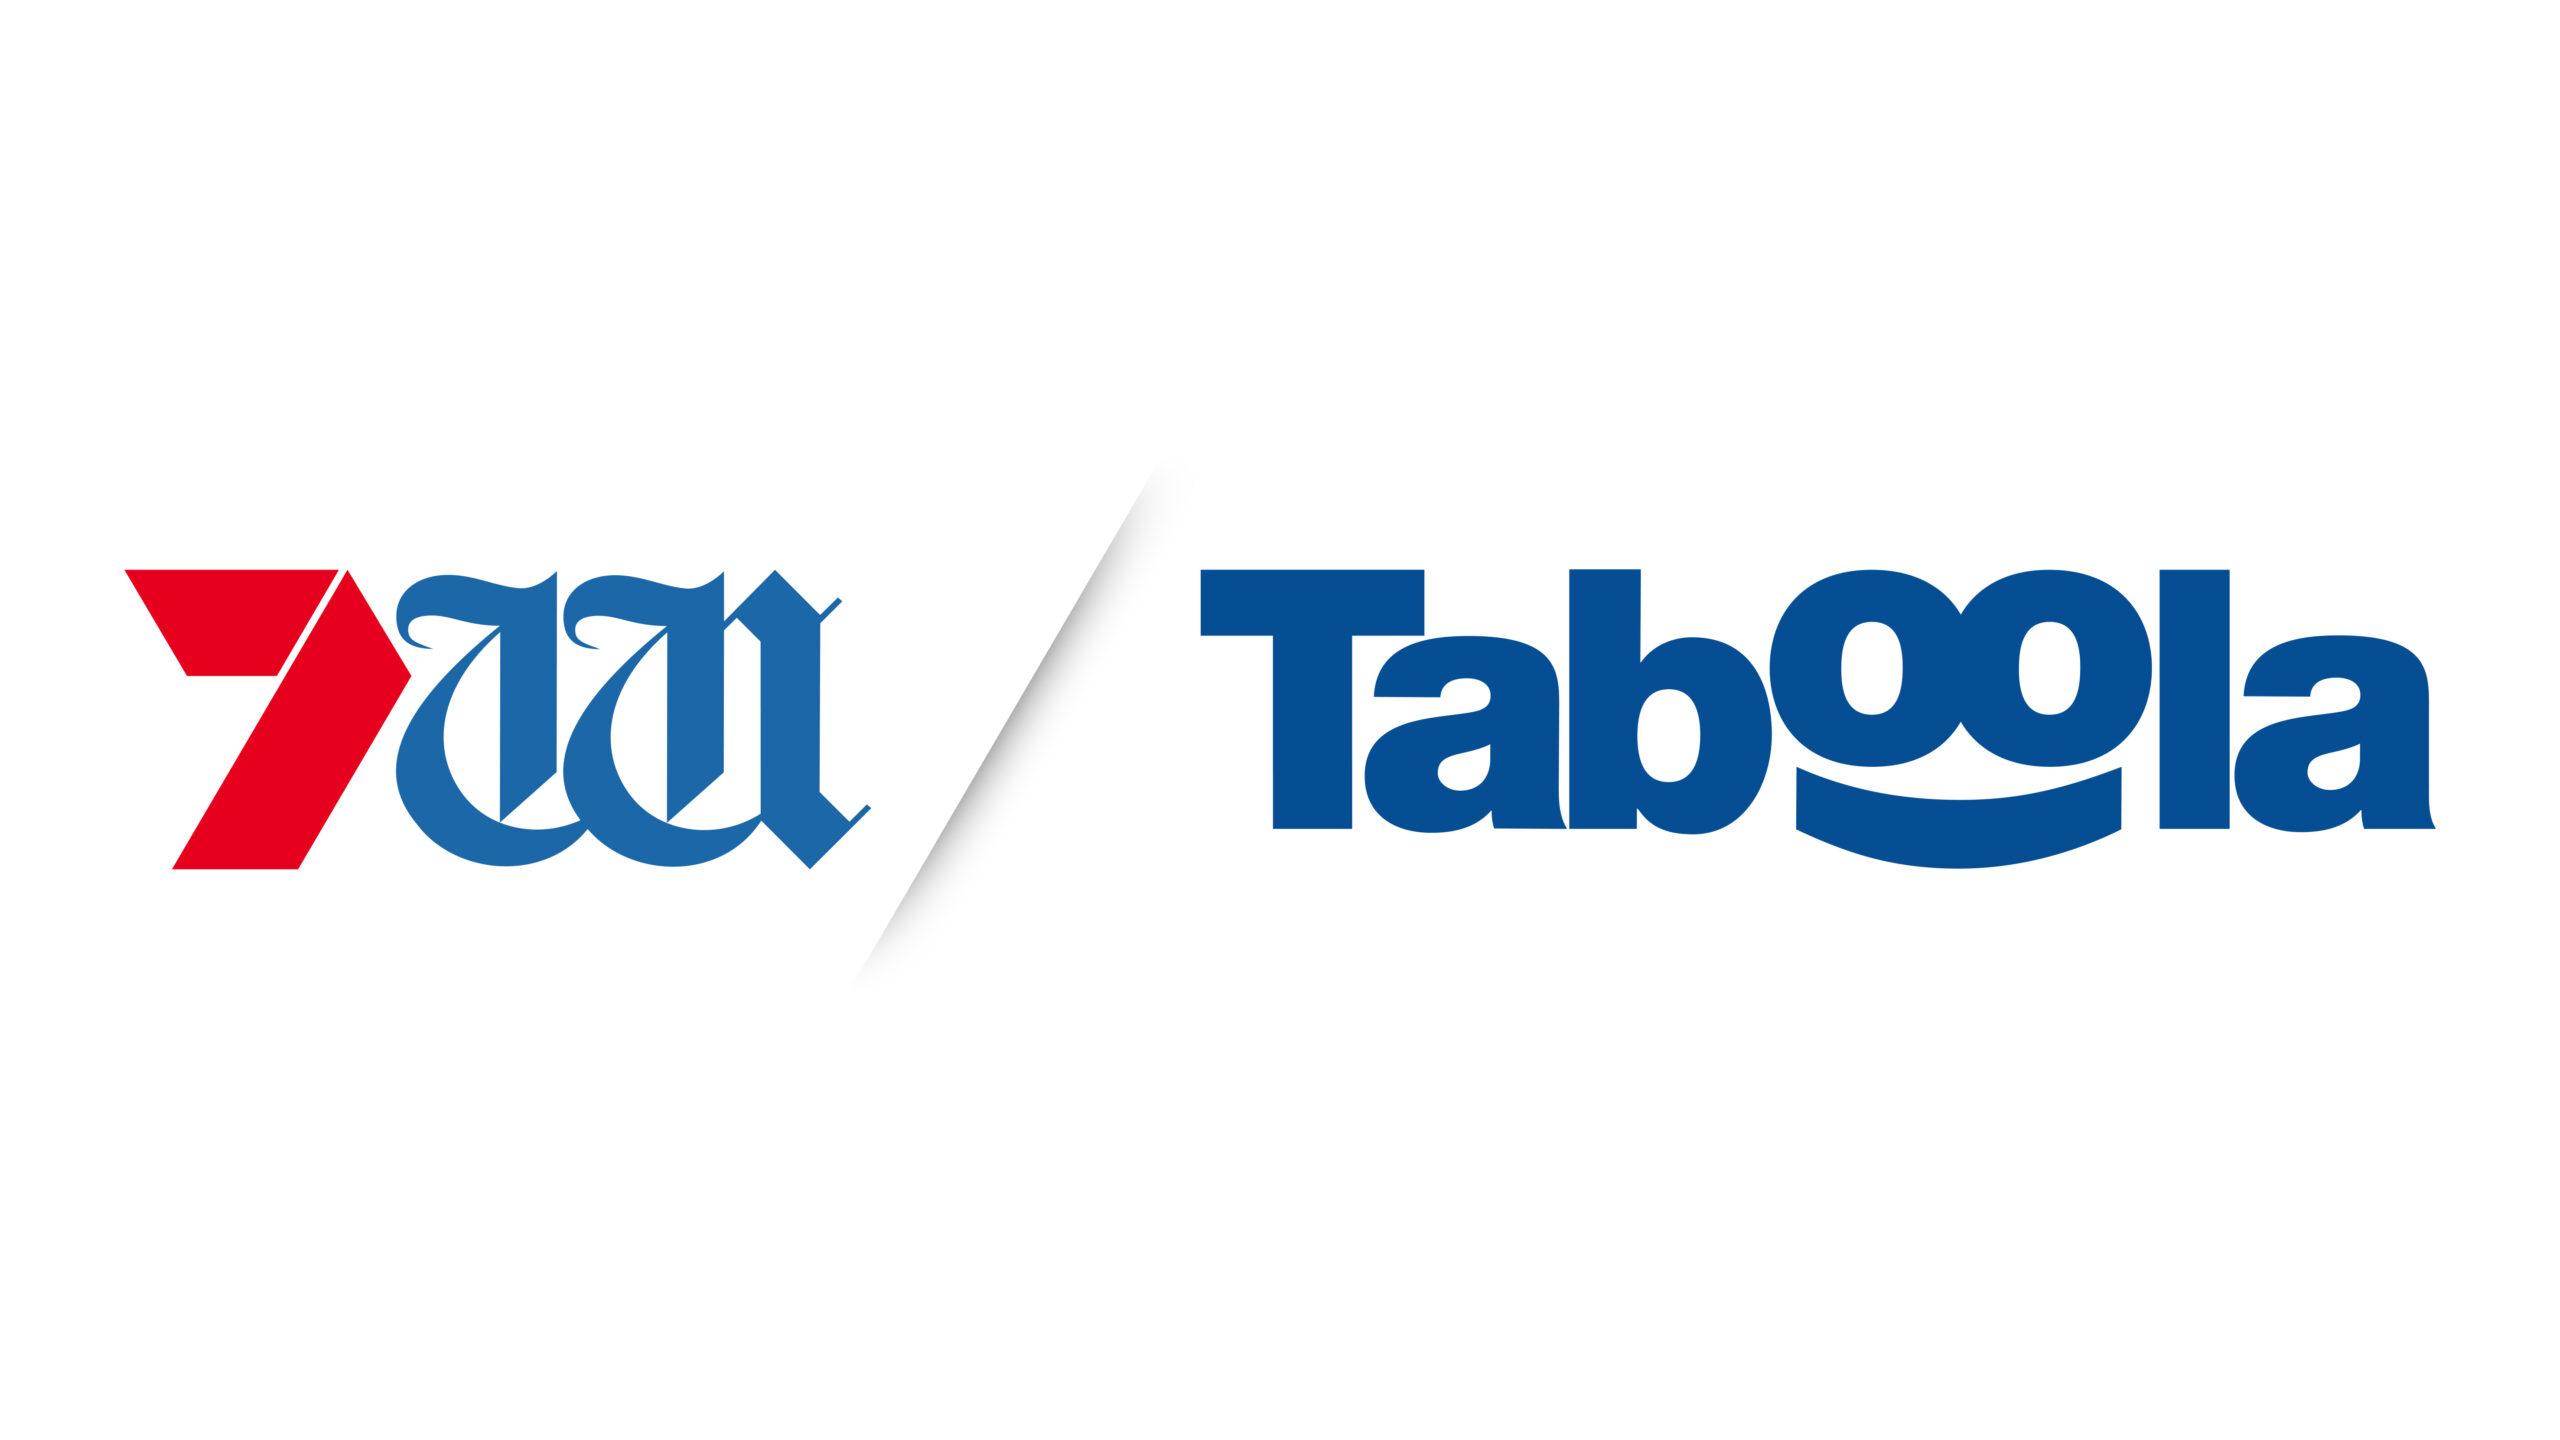 SWM and Taboola strike multi-year partnership deal